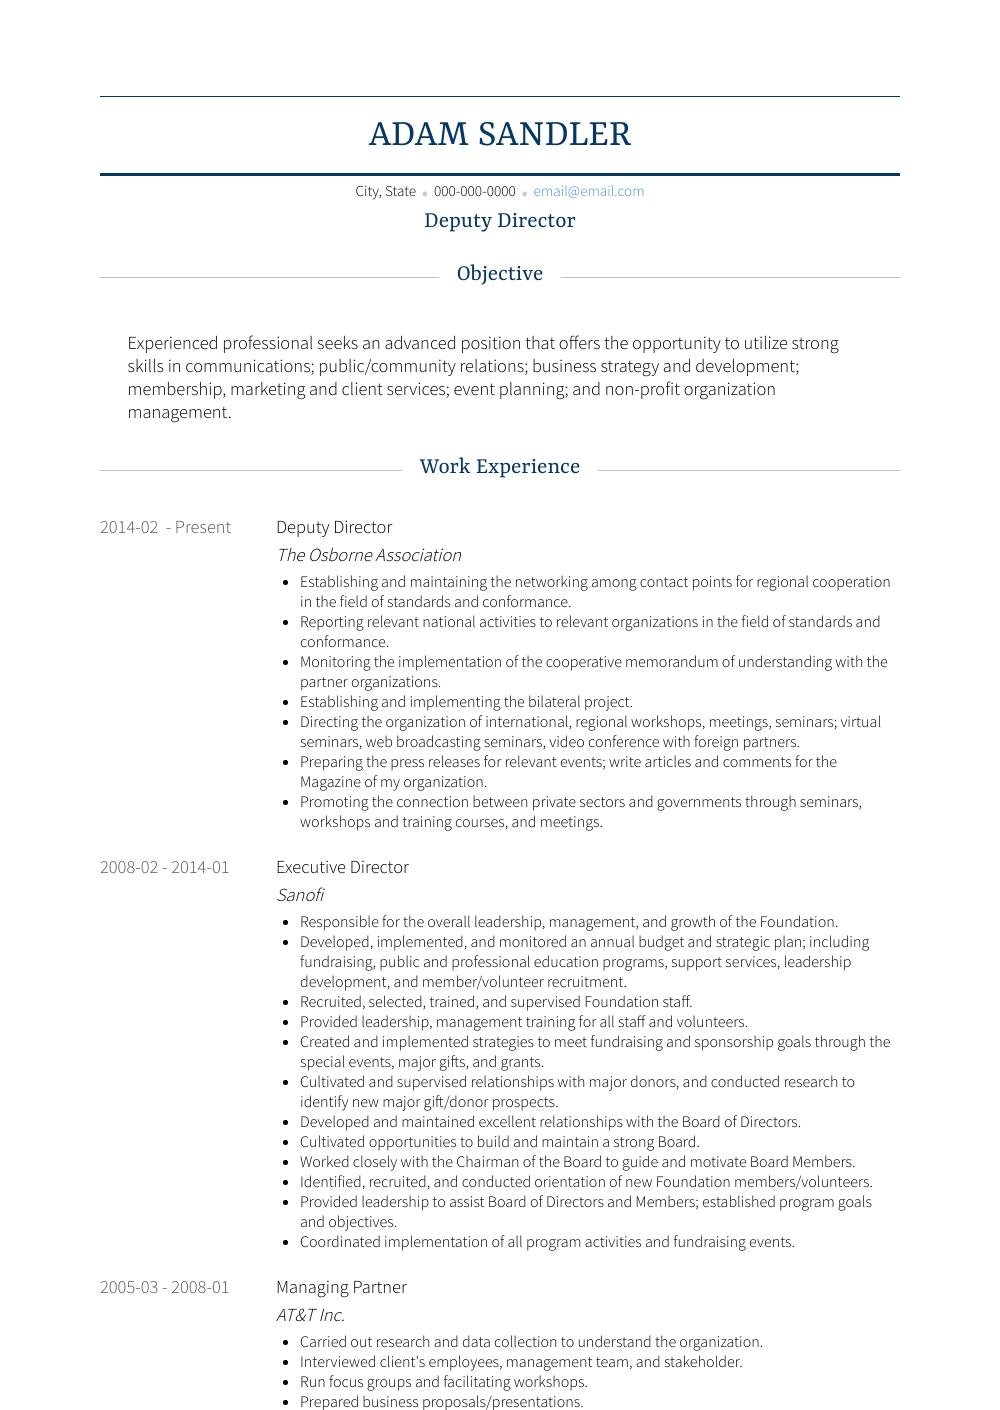 deputy director  resume samples and templates  visualcv